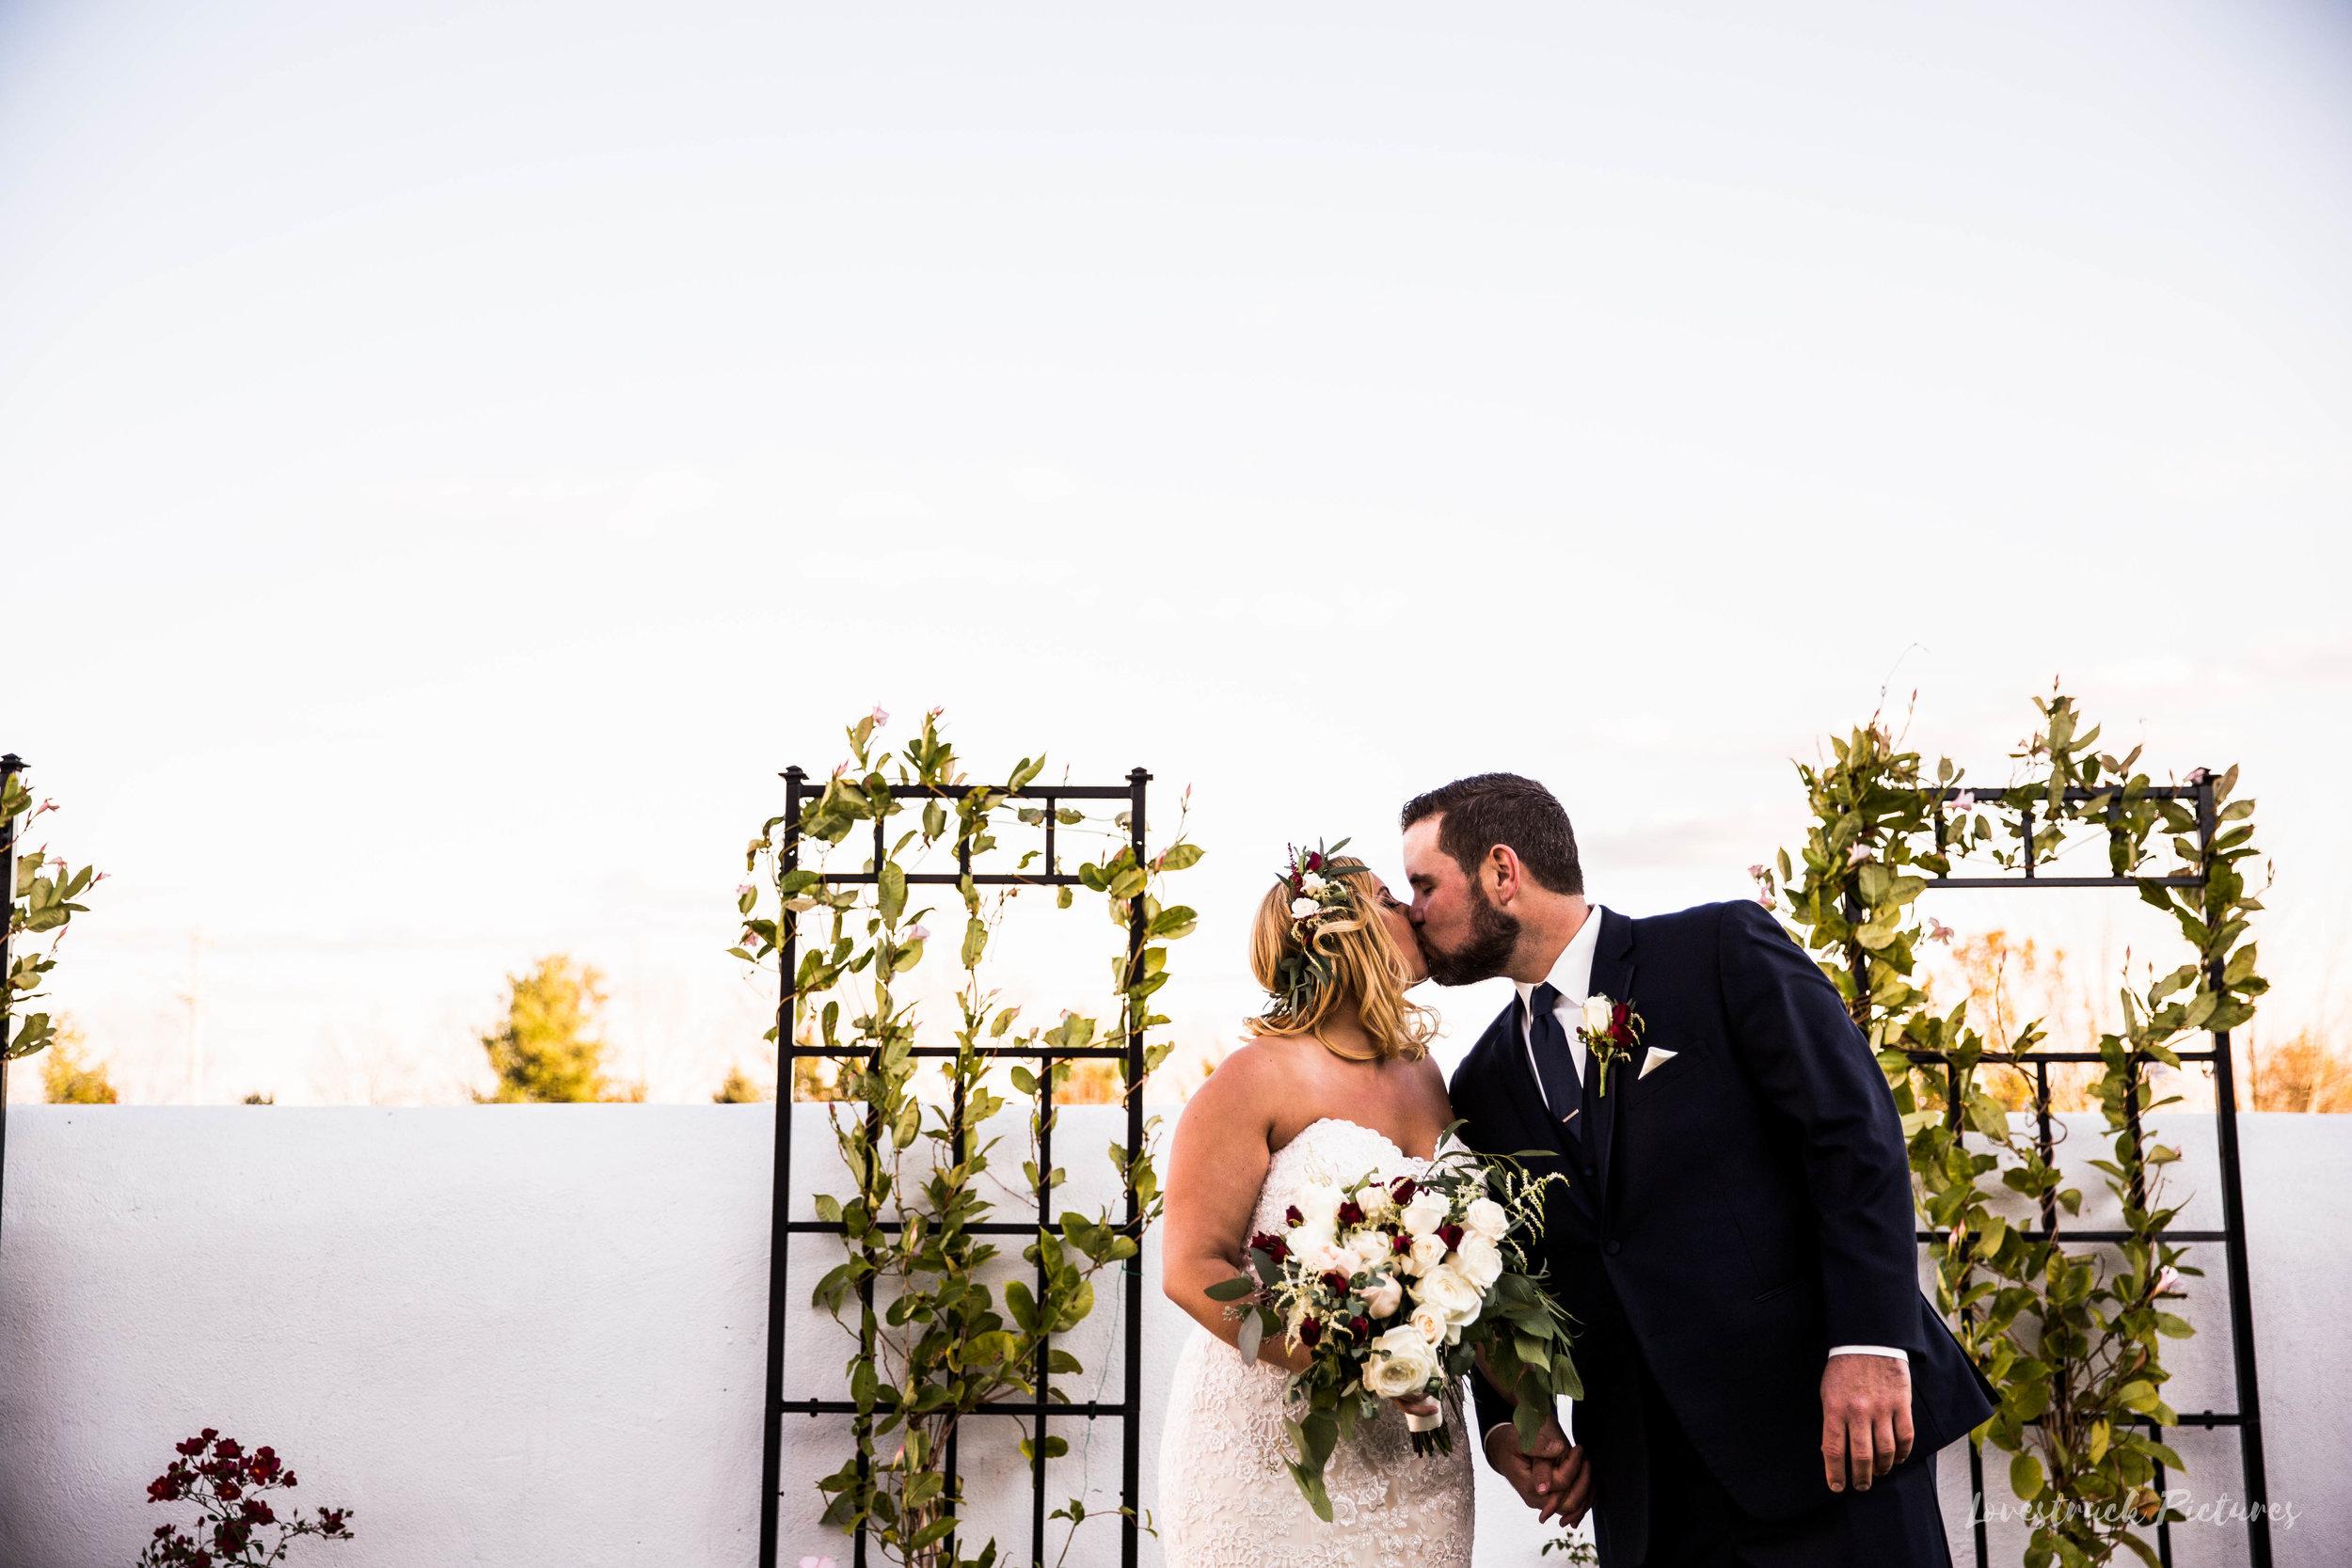 NORMANDY_FARMS_WEDDING_BLUEBELL_PA--36.jpg